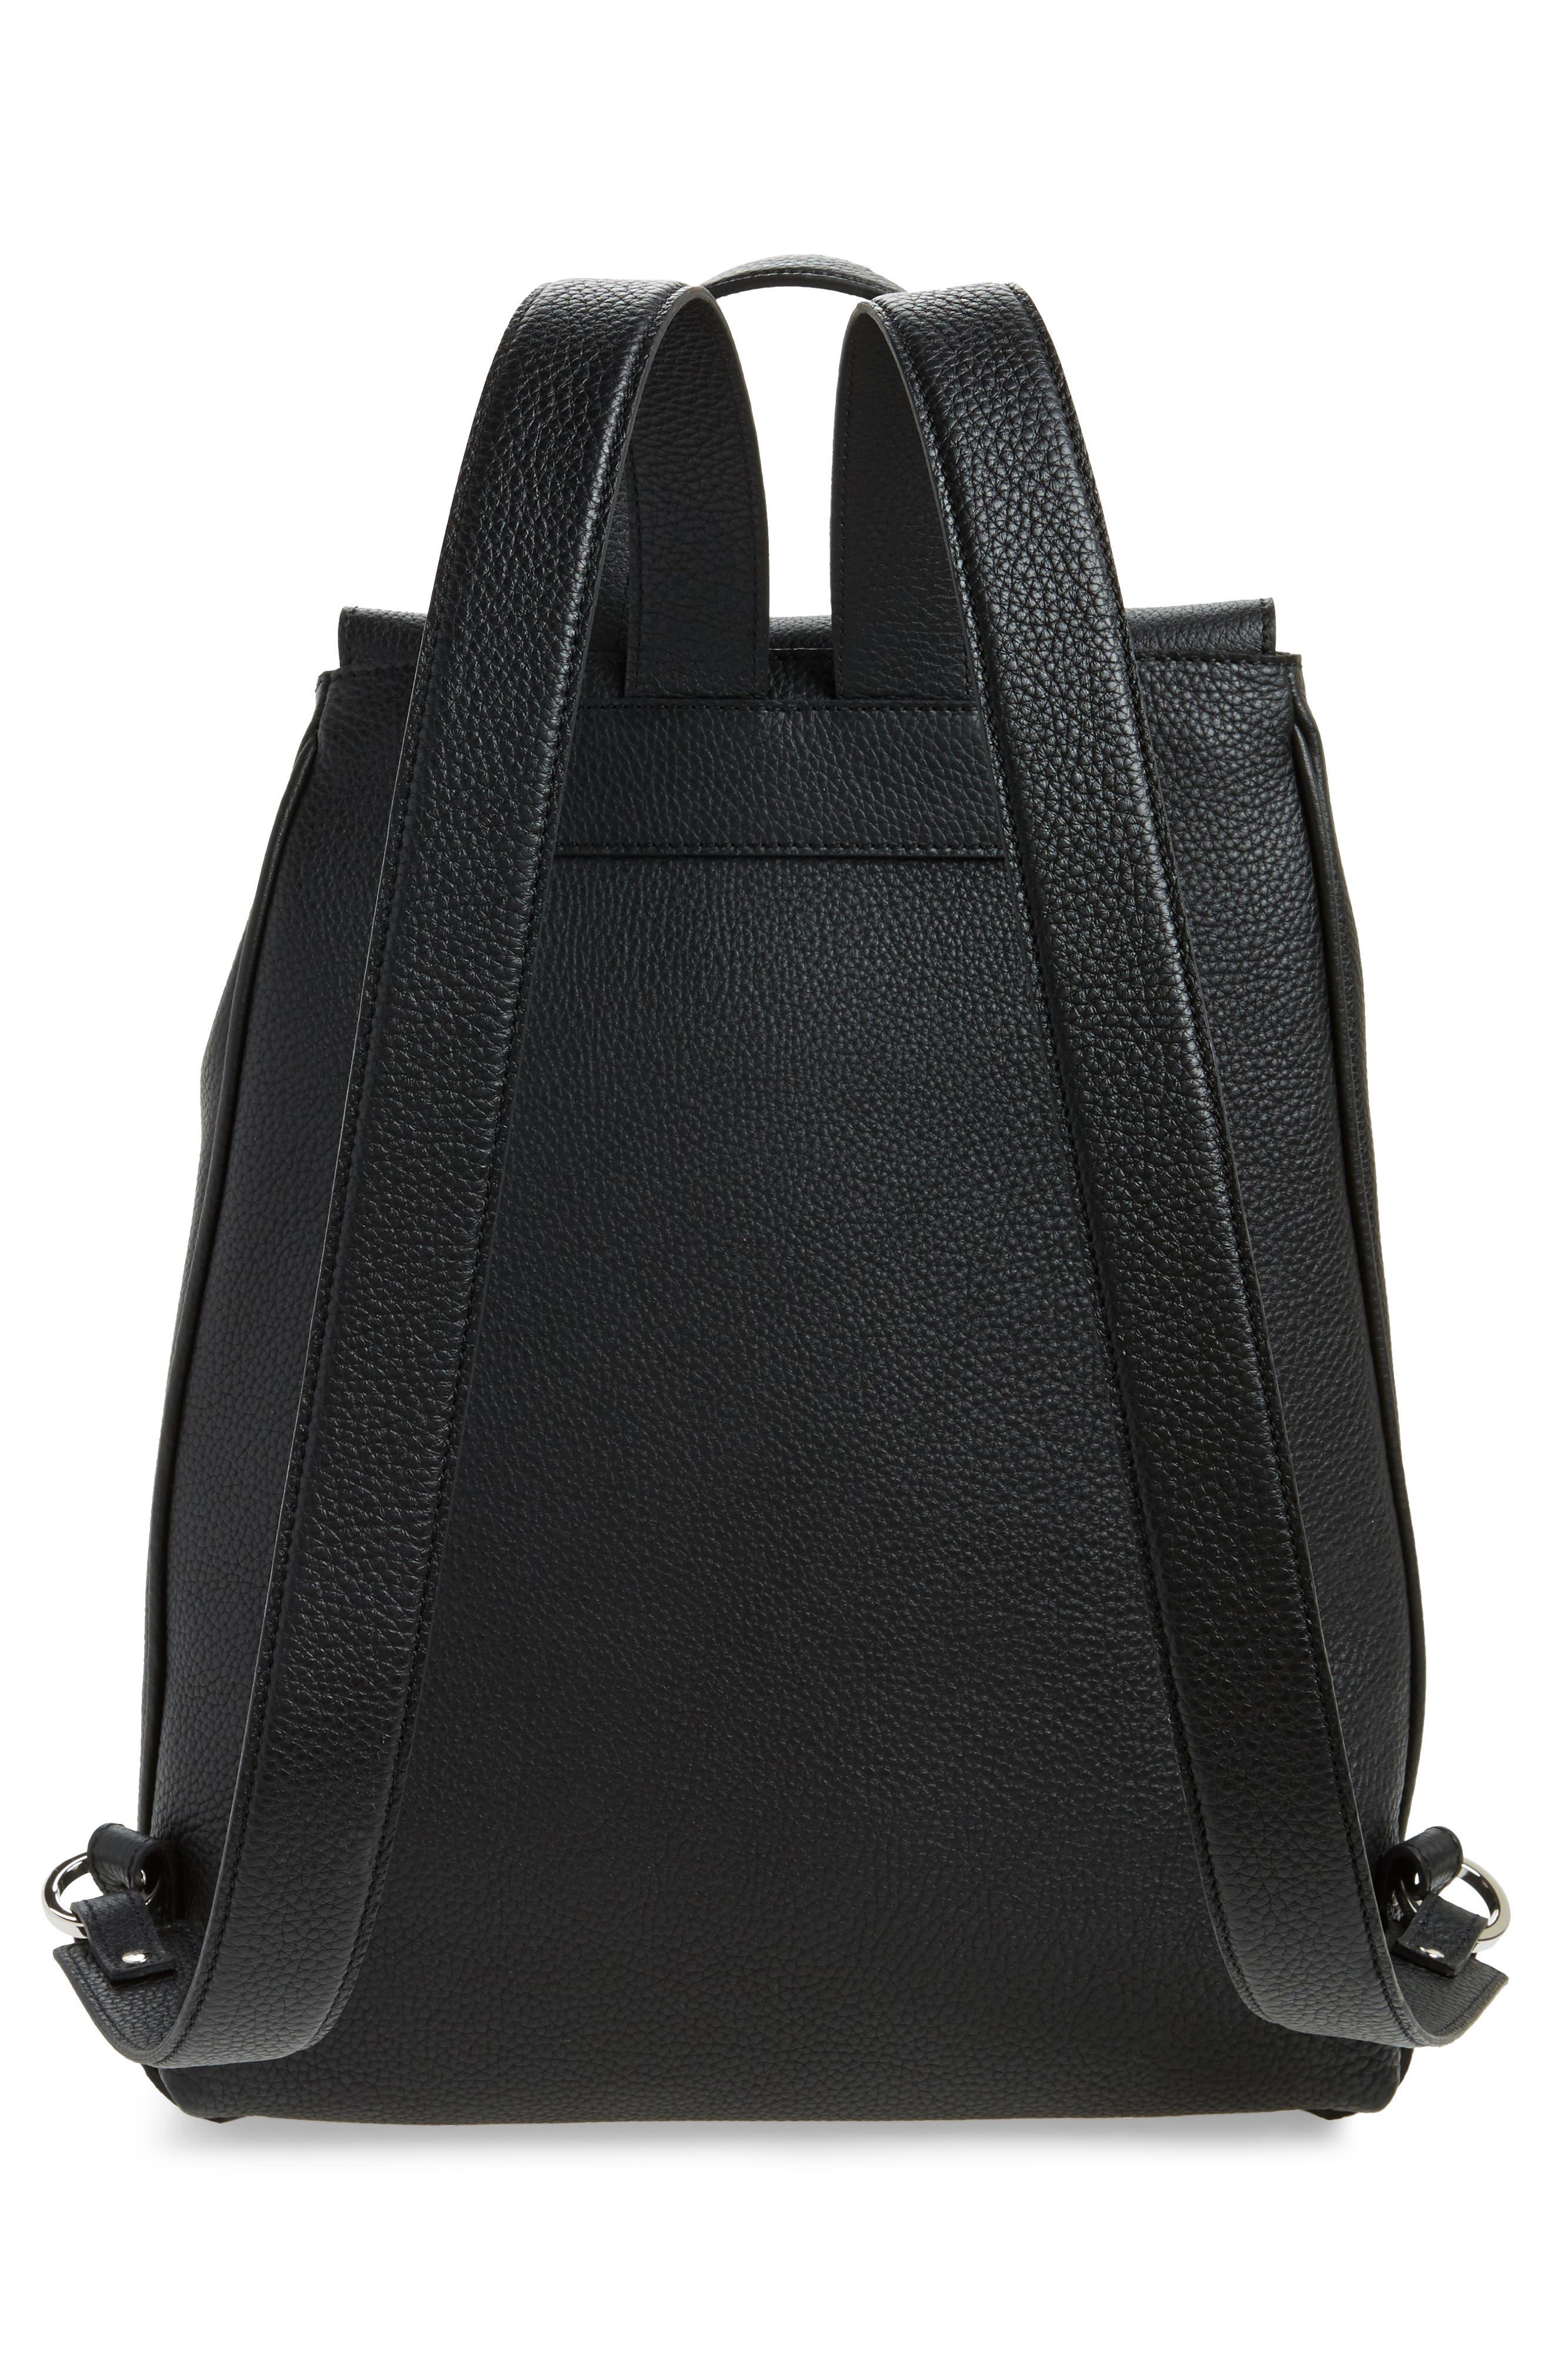 Carmen Cachemire Leather Backpack,                             Alternate thumbnail 3, color,                             Black